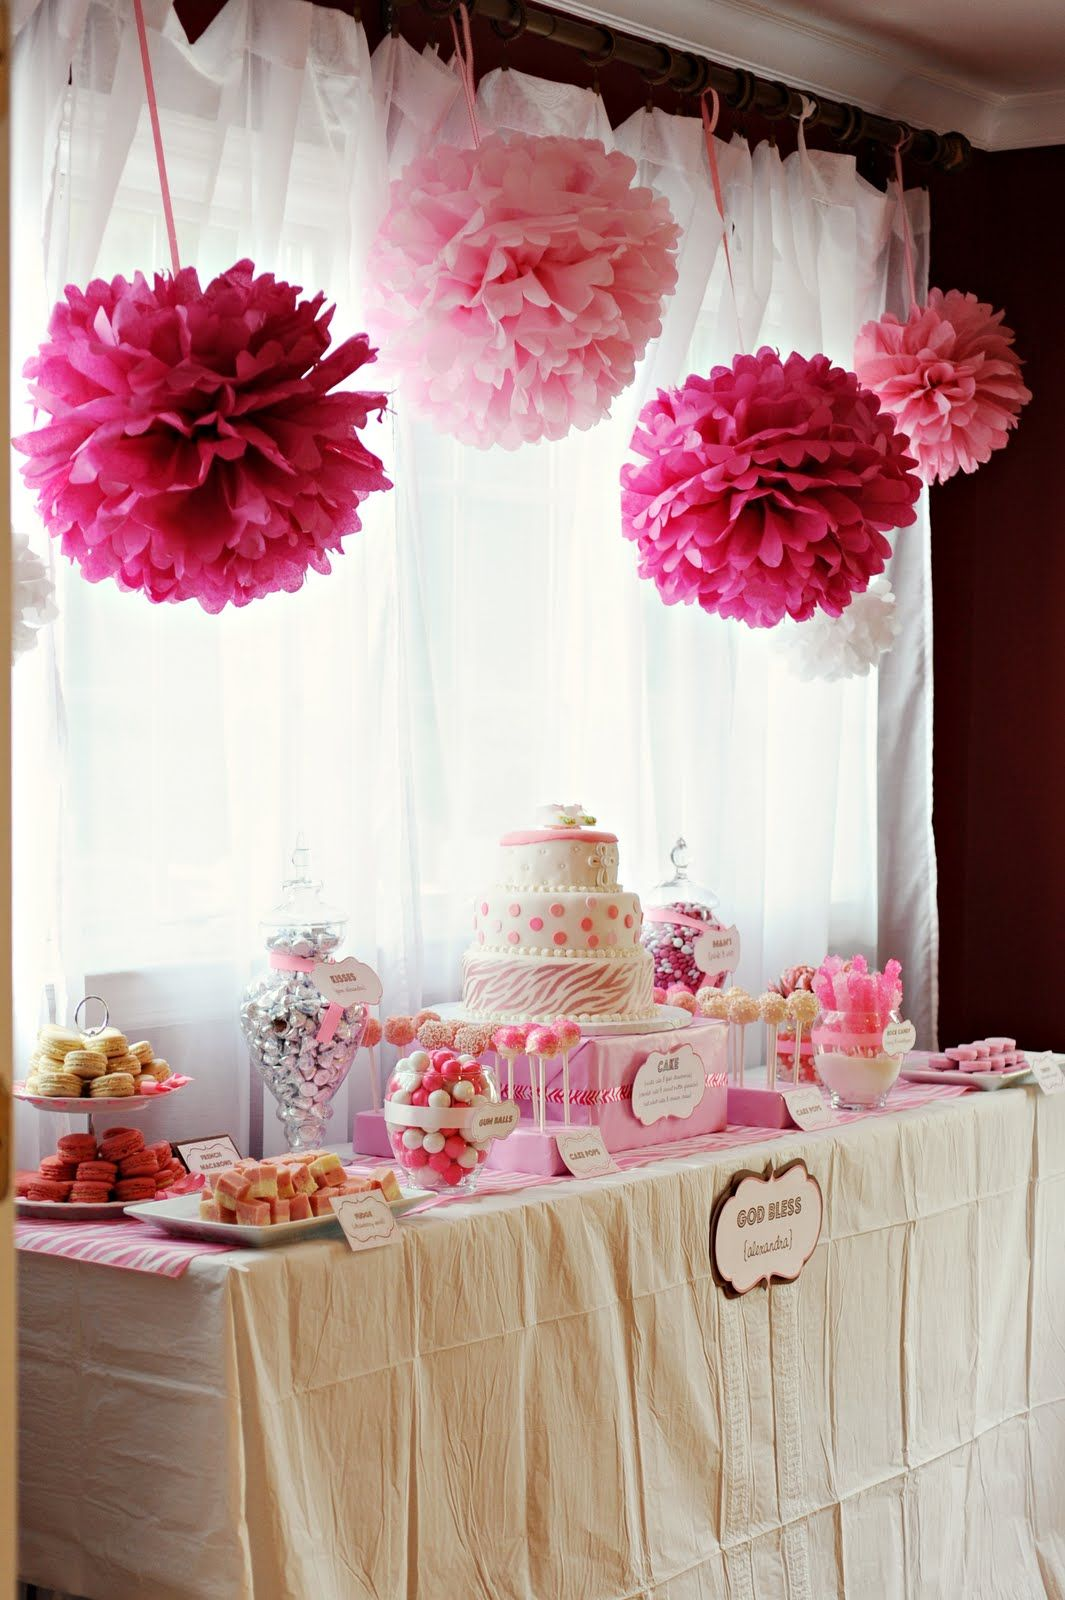 Decorations party ideas pinterest f tes soiree et - Decoracion fiesta ibicenca casera ...